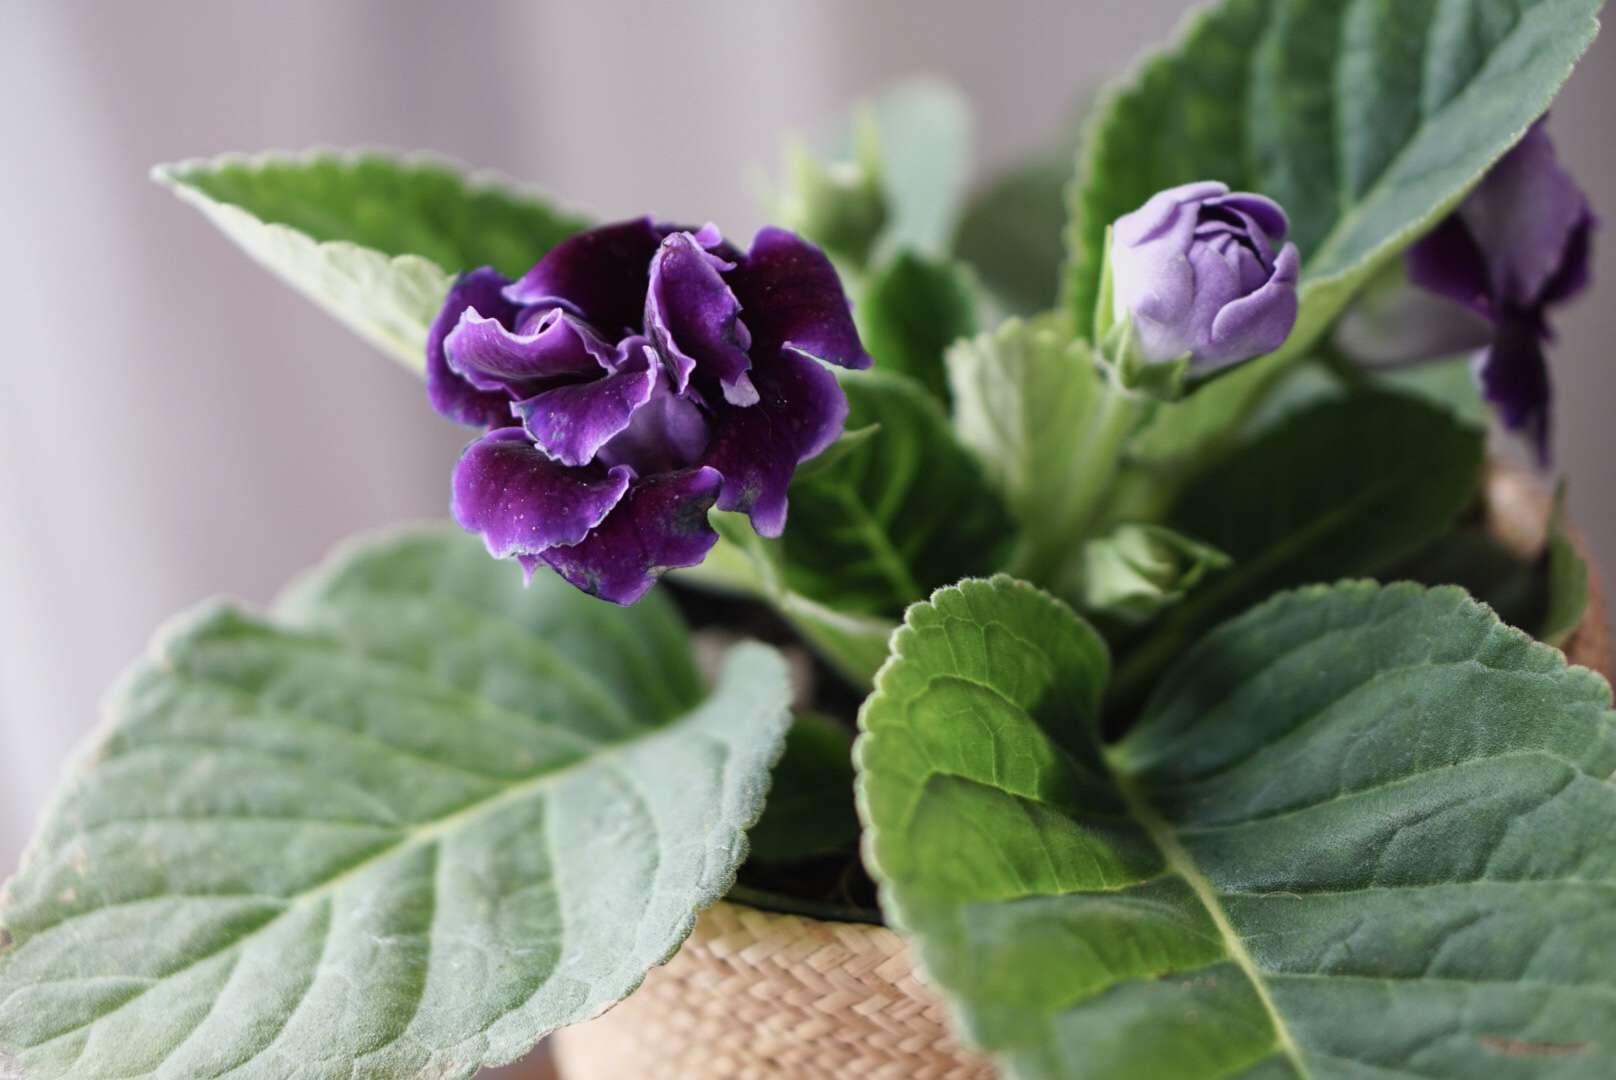 Gloxinia senningia hybrid plant with purple flower and light purple bud closeup